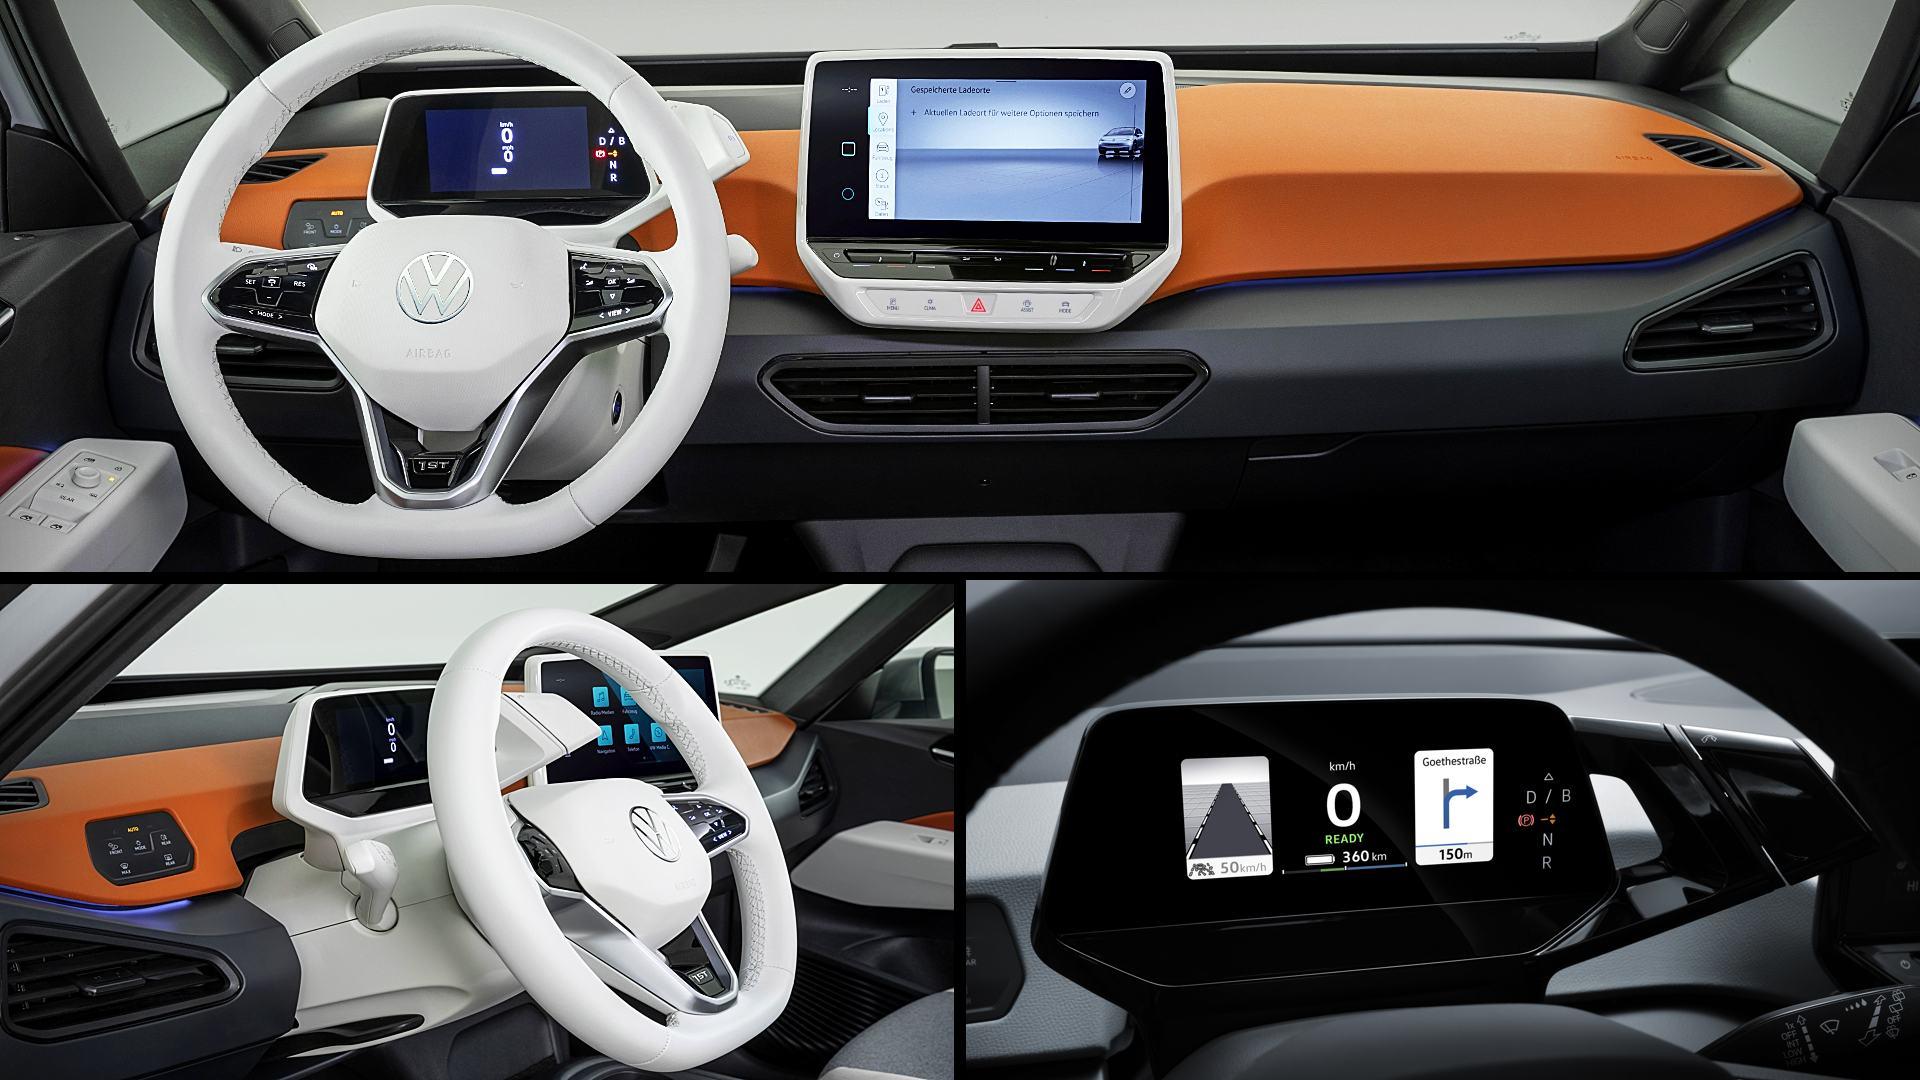 2020 VW ID 3 Interior Images